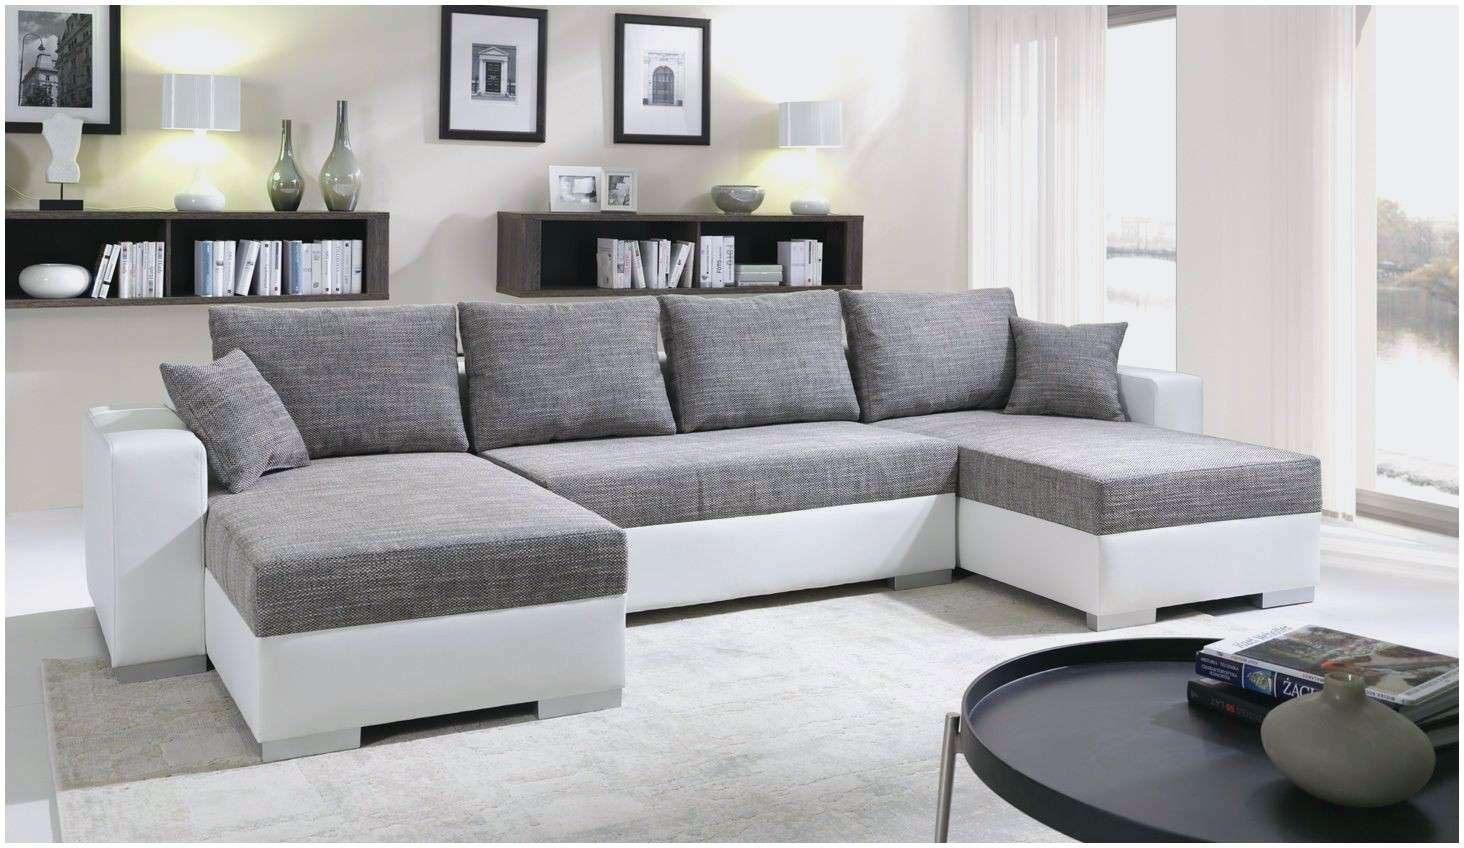 Canapé Lit Simili Cuir Charmant Elégant Canapé Angle Habitat Luxe S Canap Simili Cuir Marron 27 C3